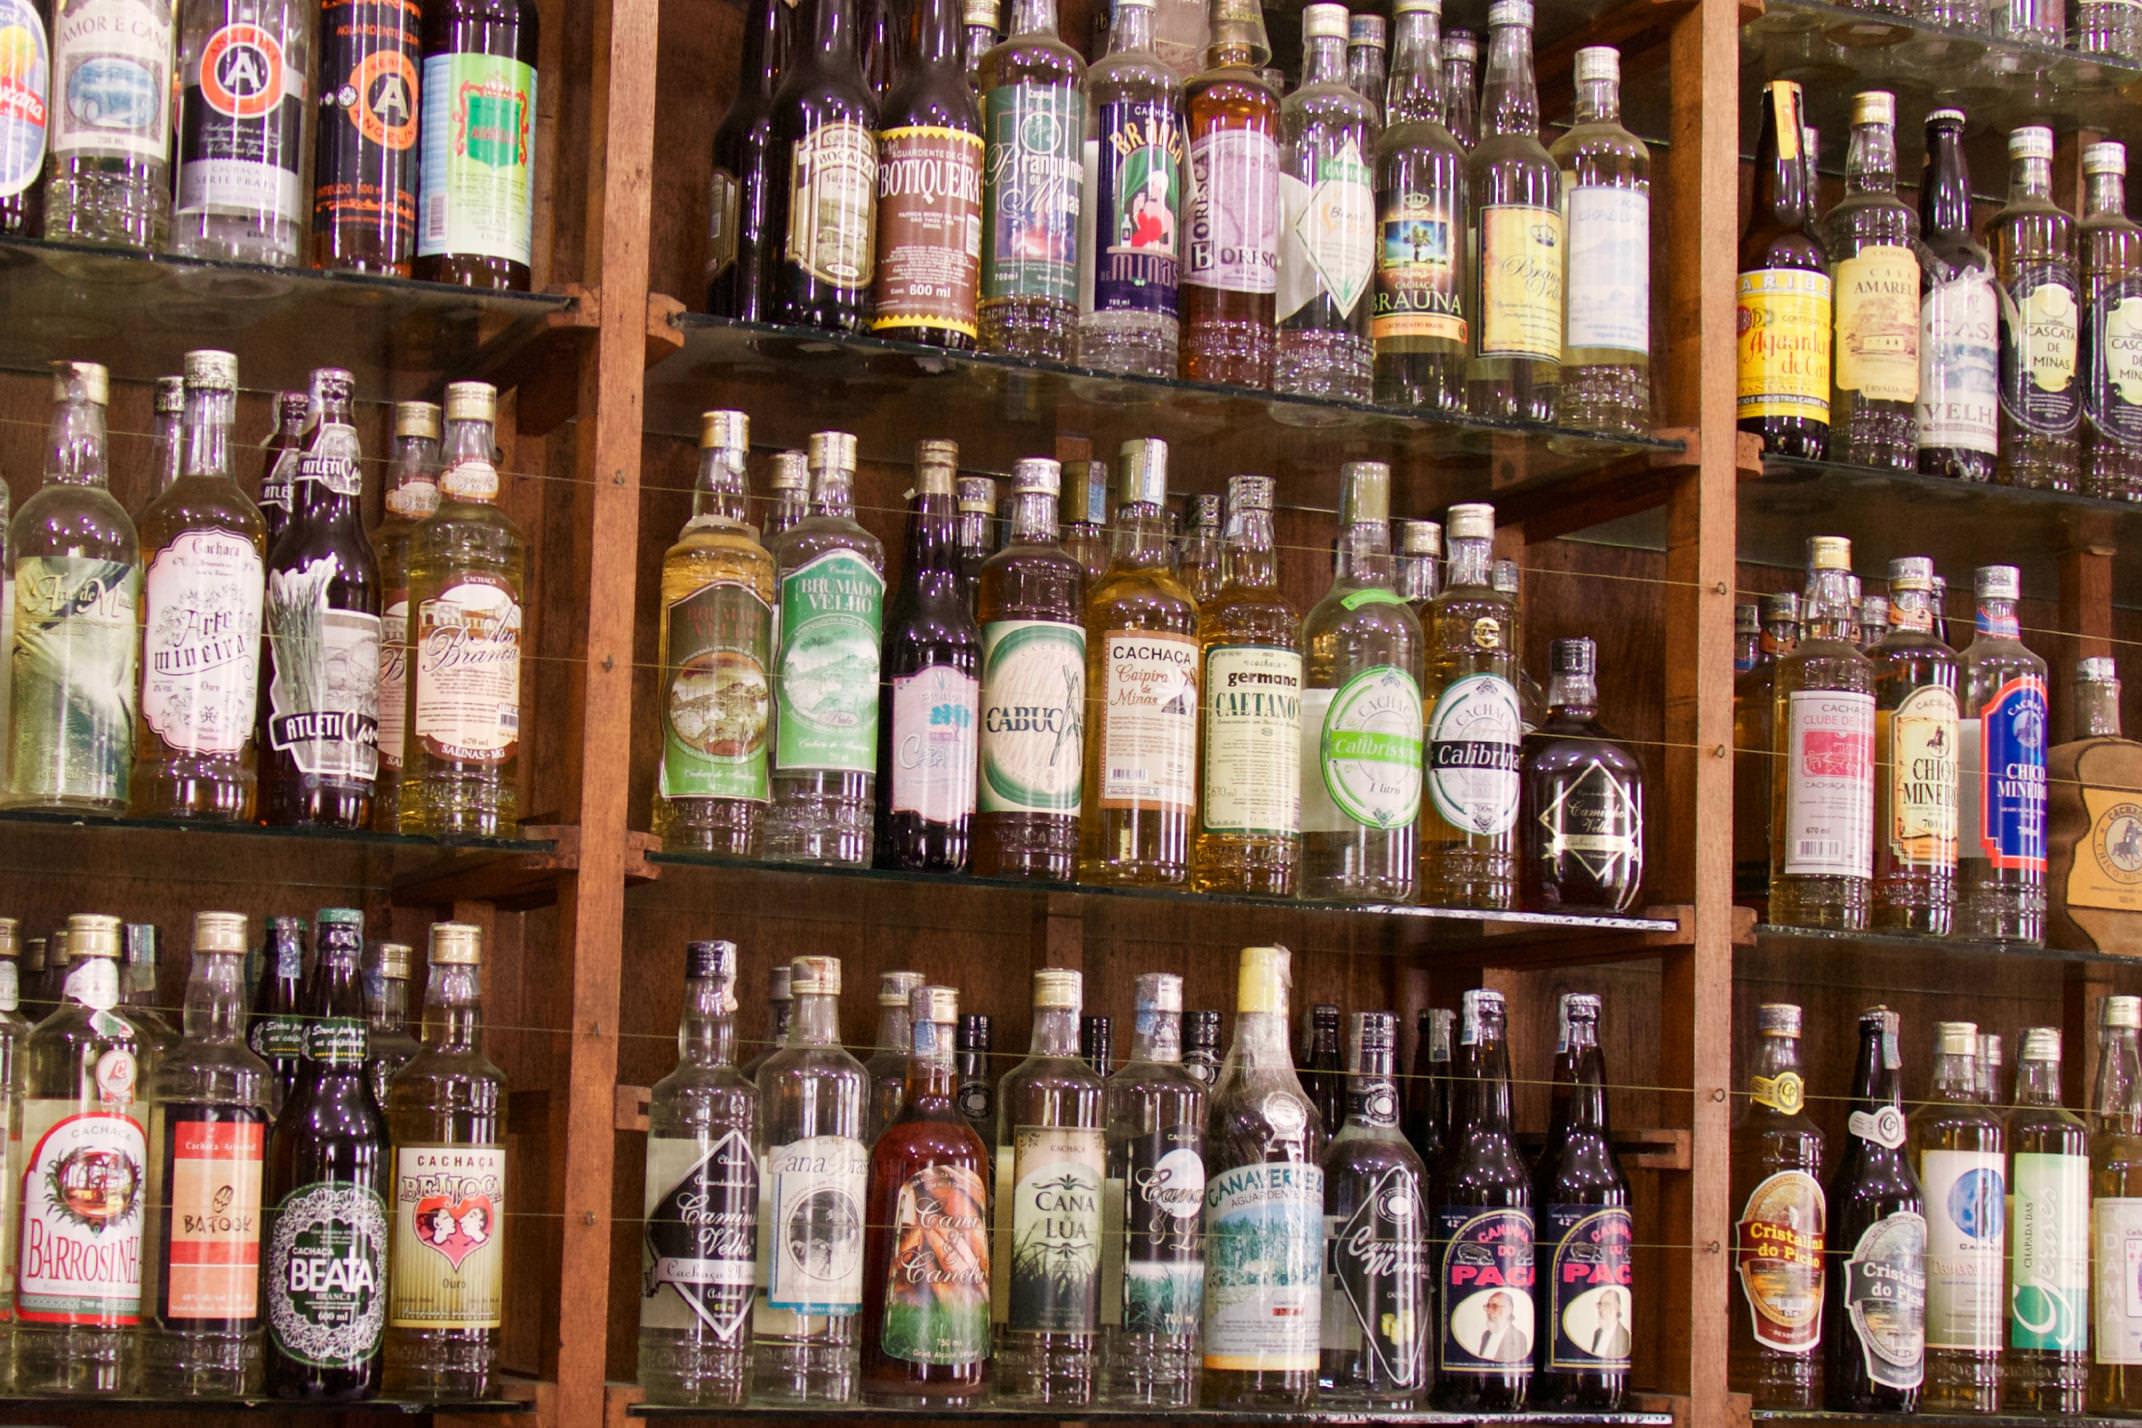 Brazil paraty cachaca bottles copyright pura aventura thomas power